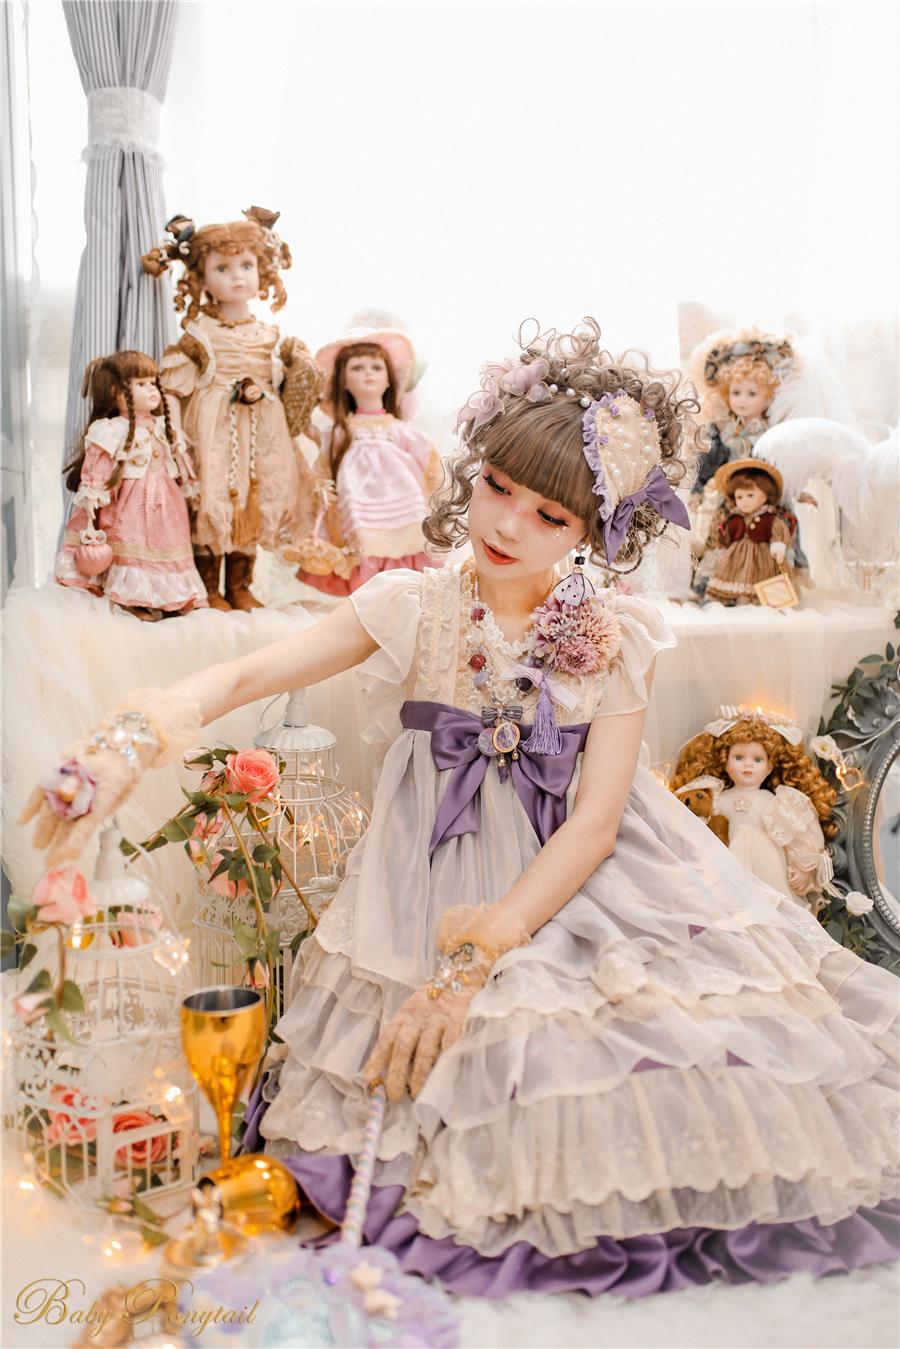 Babyponytail_Model Photo_Present Angel_JSK Violet_2_Kaka_10.jpg